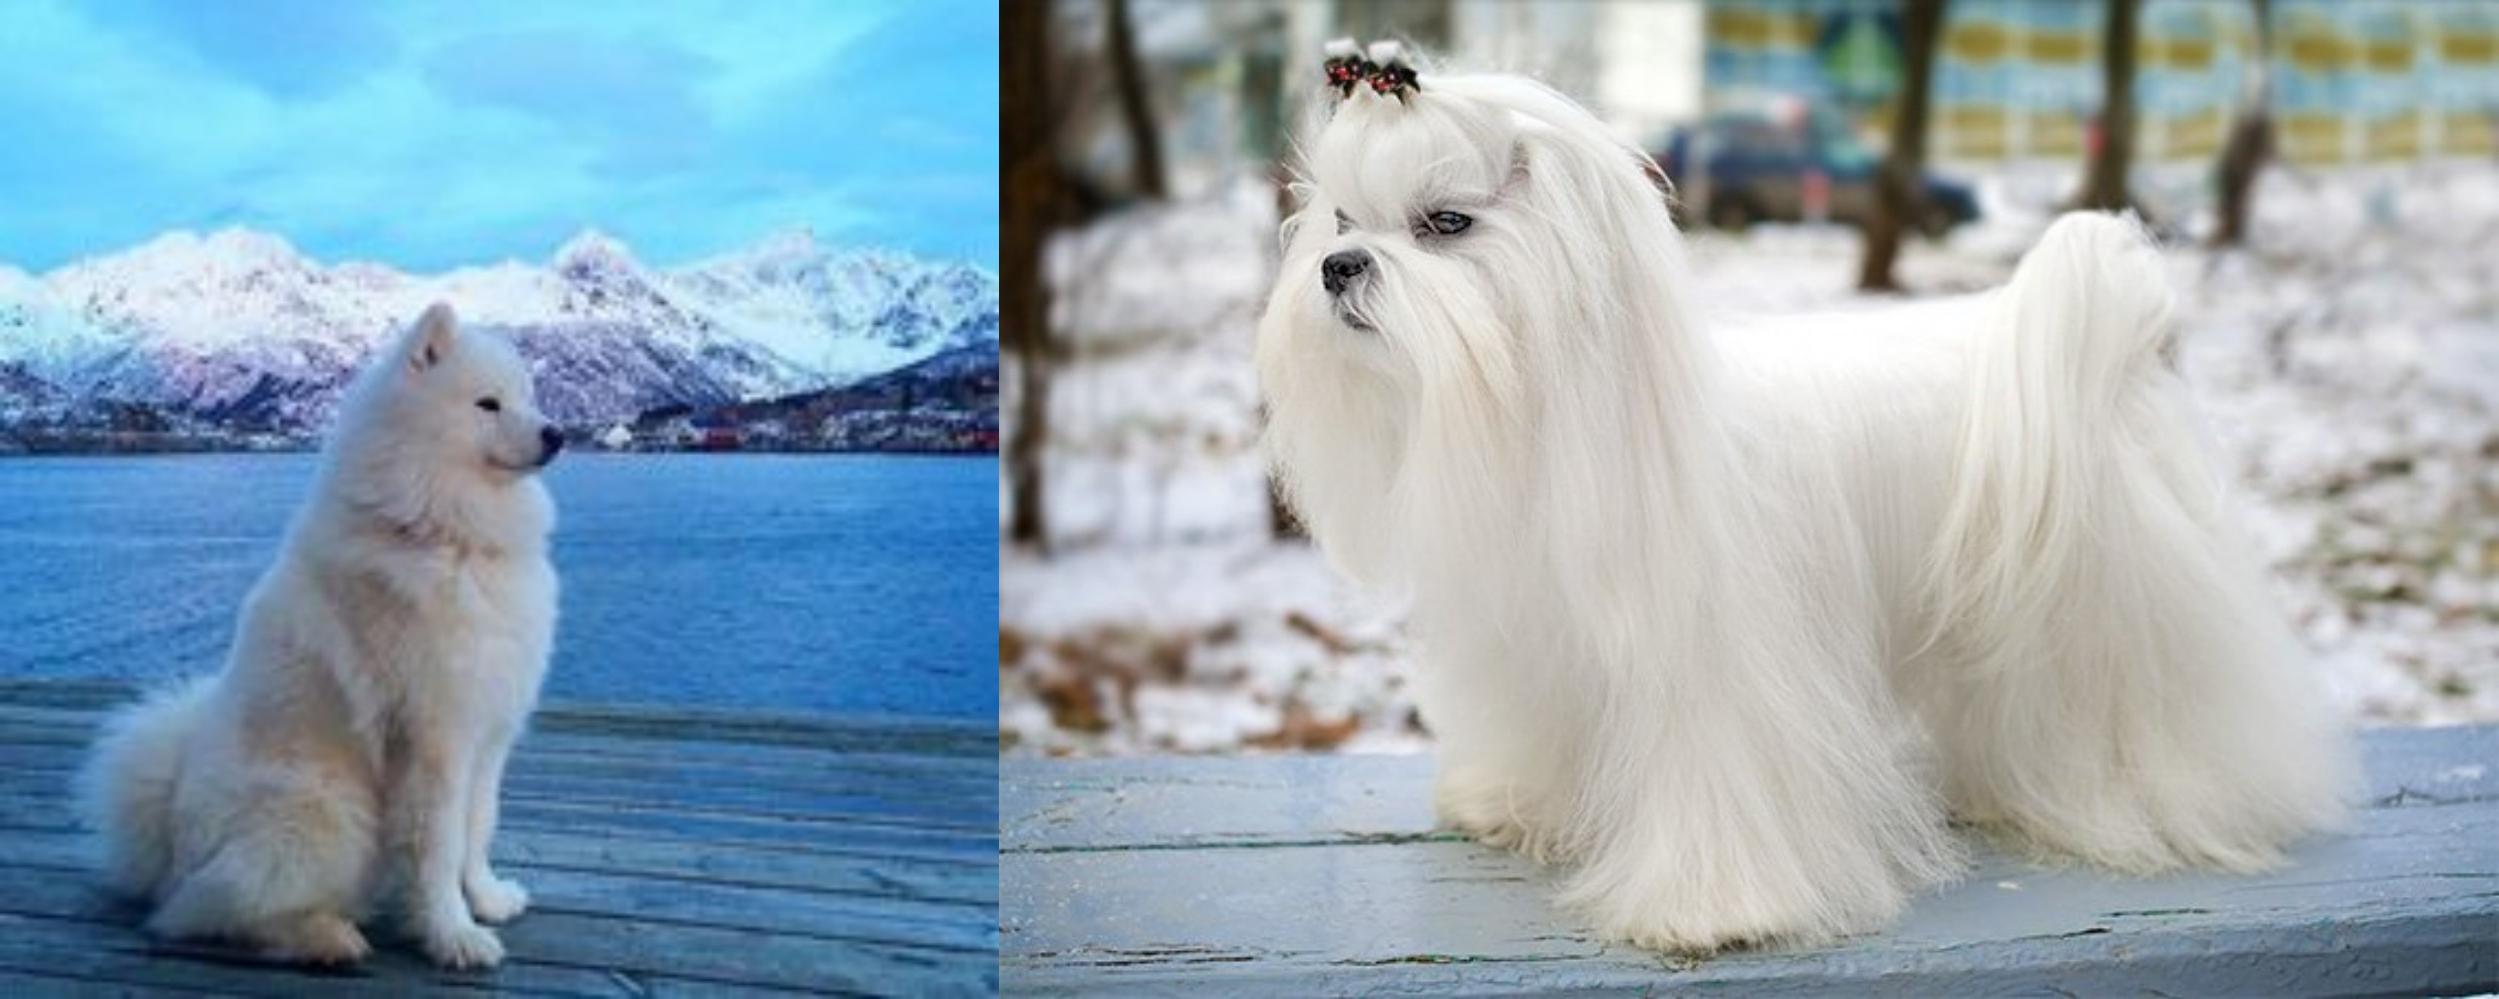 Samoyed Vs Maltese Breed Comparison